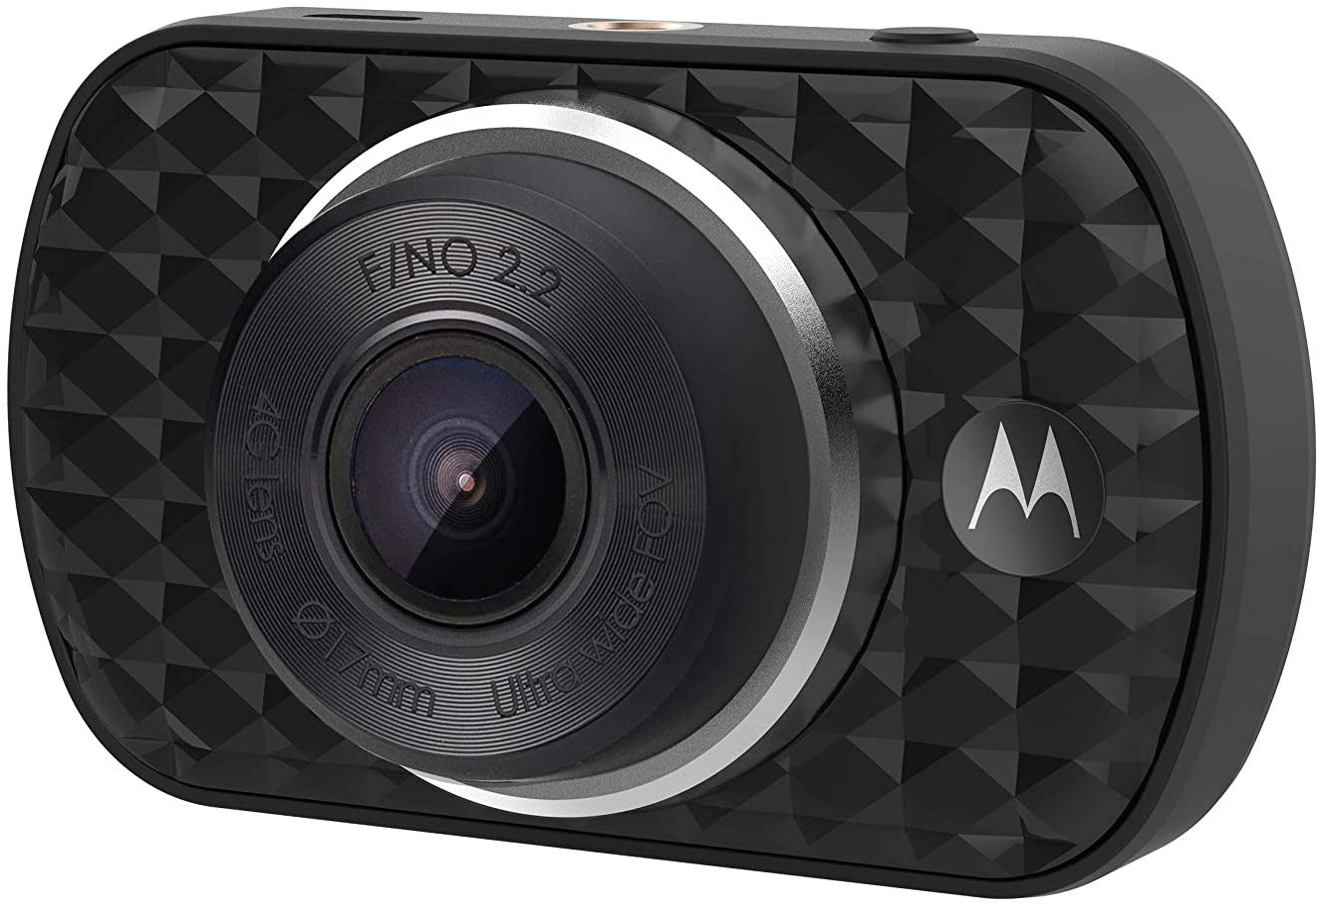 Motorola MDC150 - Boucle Vidéo Full HD avec écran LCD 2